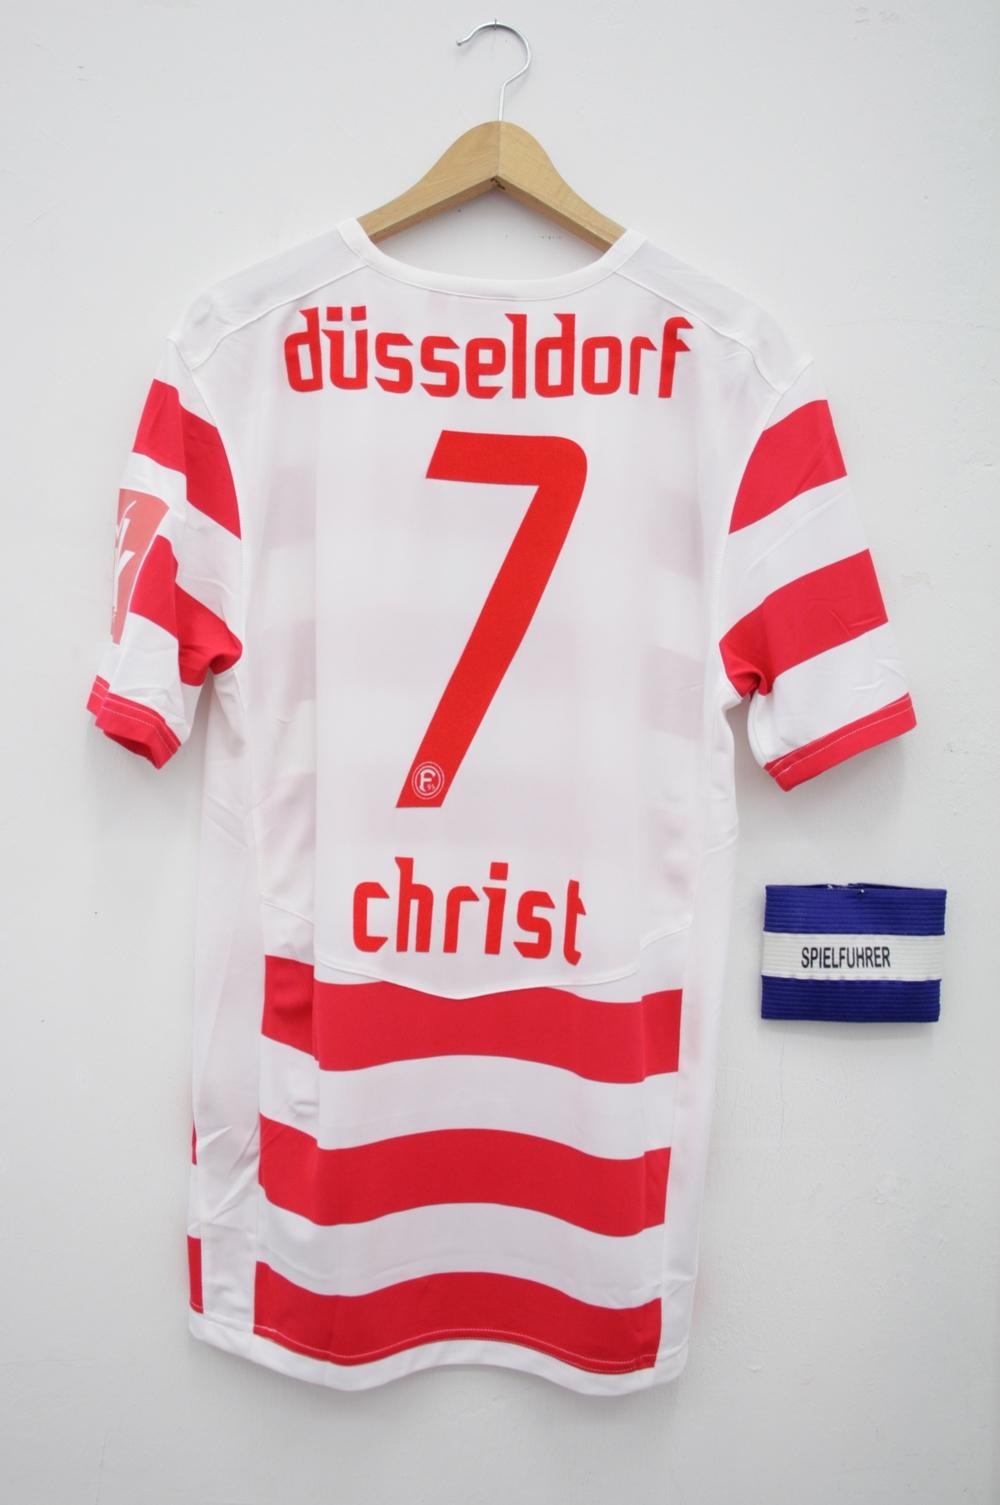 Düsseldorf 7 Christ